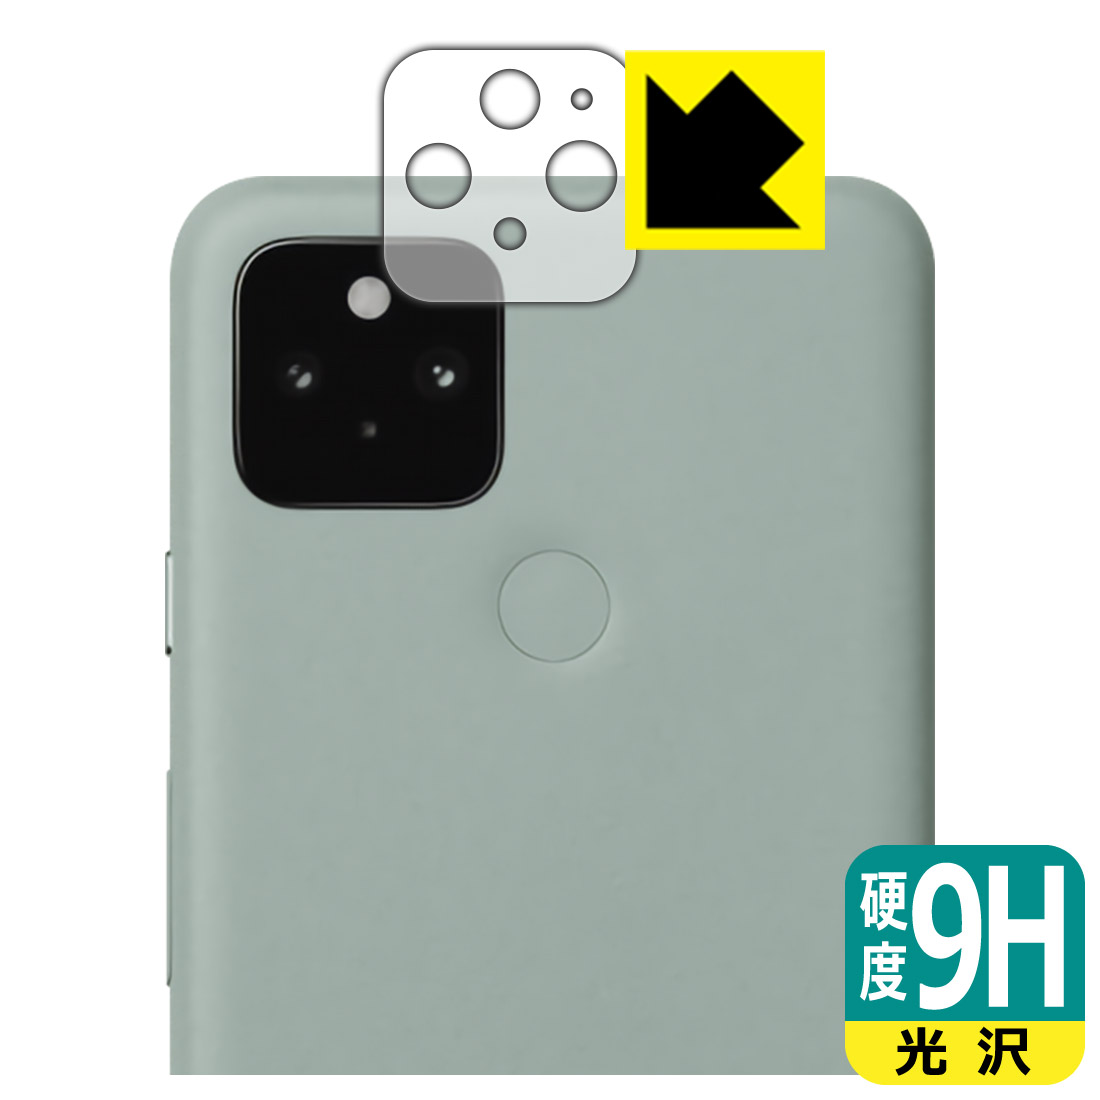 9H高硬度タイプ 光沢 Google Pixel 5 レンズ周辺部用 専用保護フィルム 保護シート  液晶保護フィルム ポスト投函送料無料 9H高硬度 保護フィルム smtb-kd